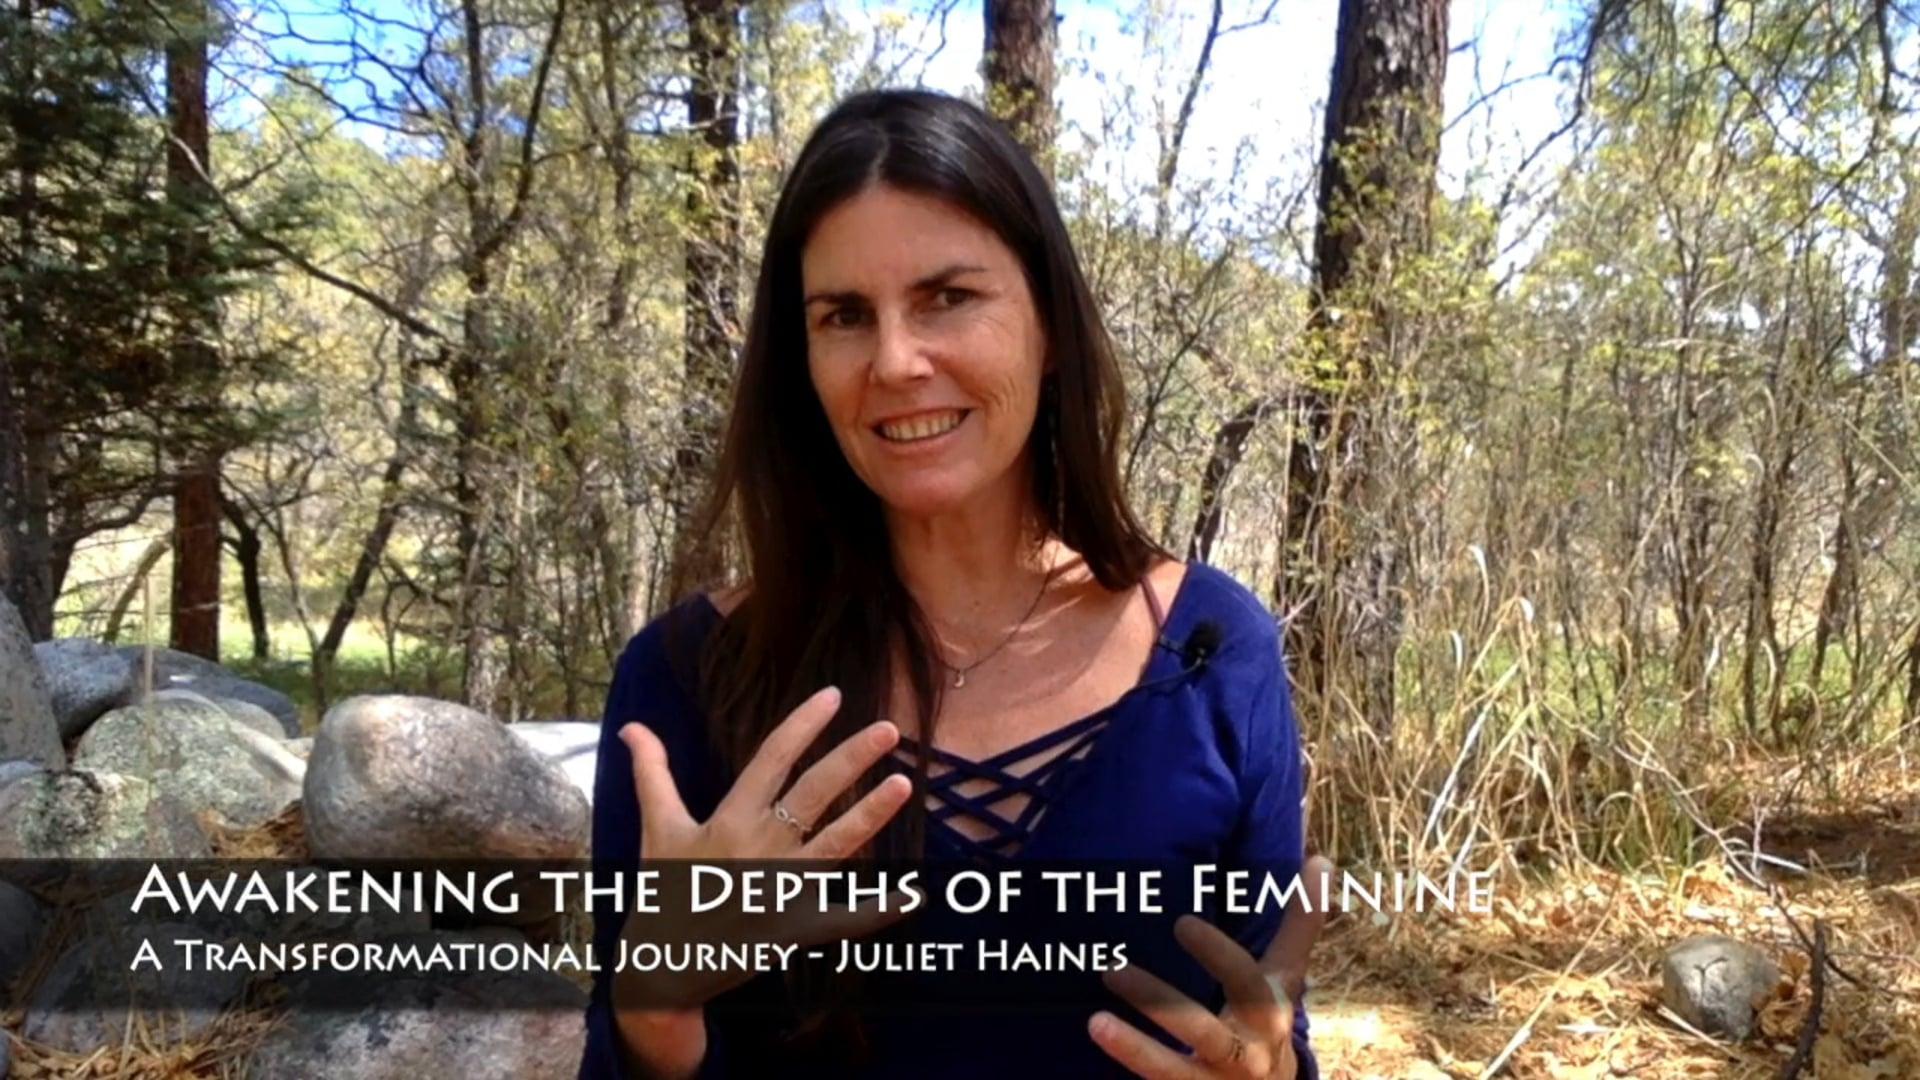 Awakening the Depths of the Feminine - A Transformational Journey